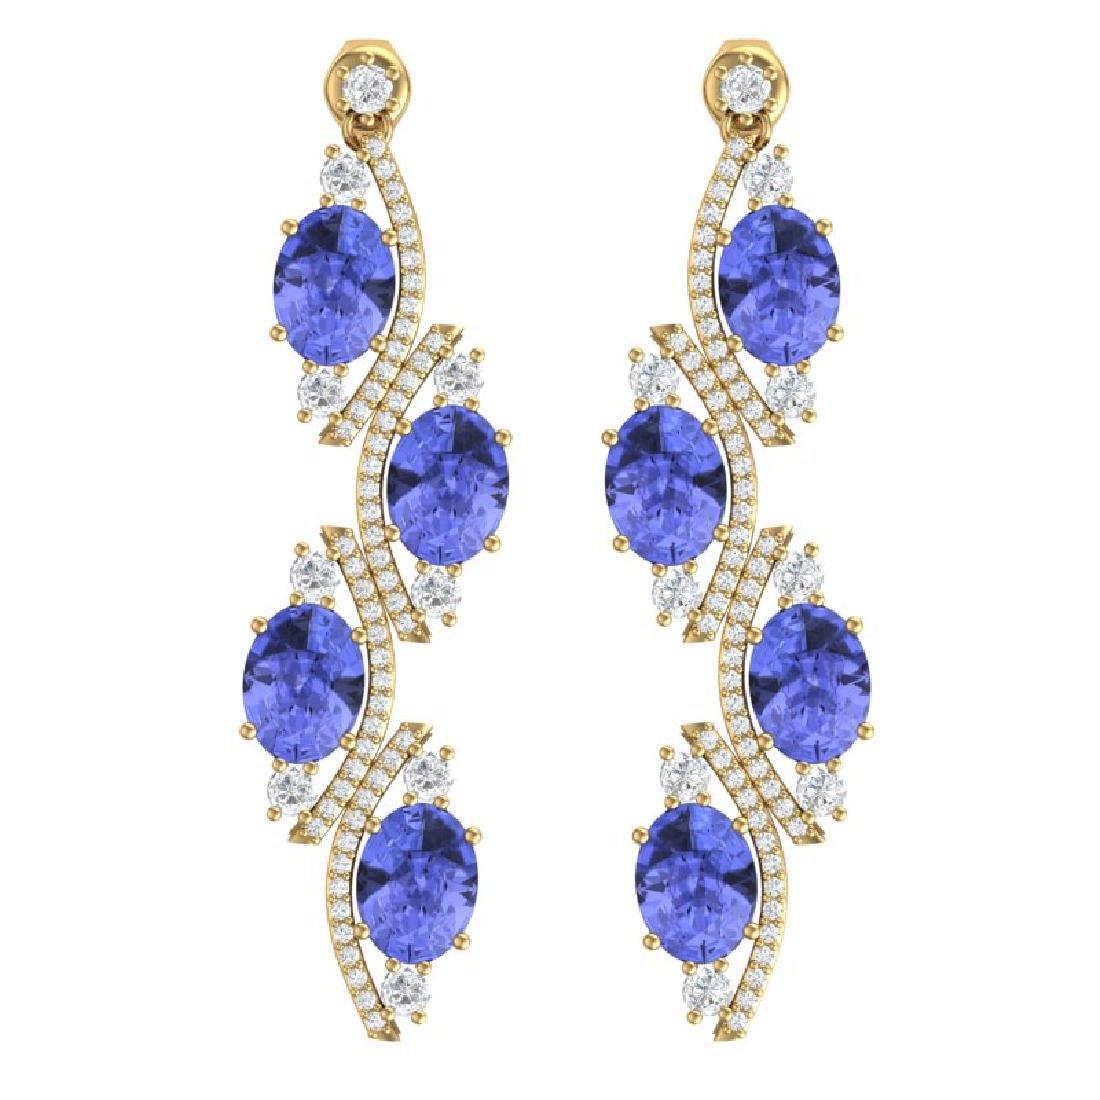 16.23 CTW Royalty Tanzanite & VS Diamond Earrings 18K